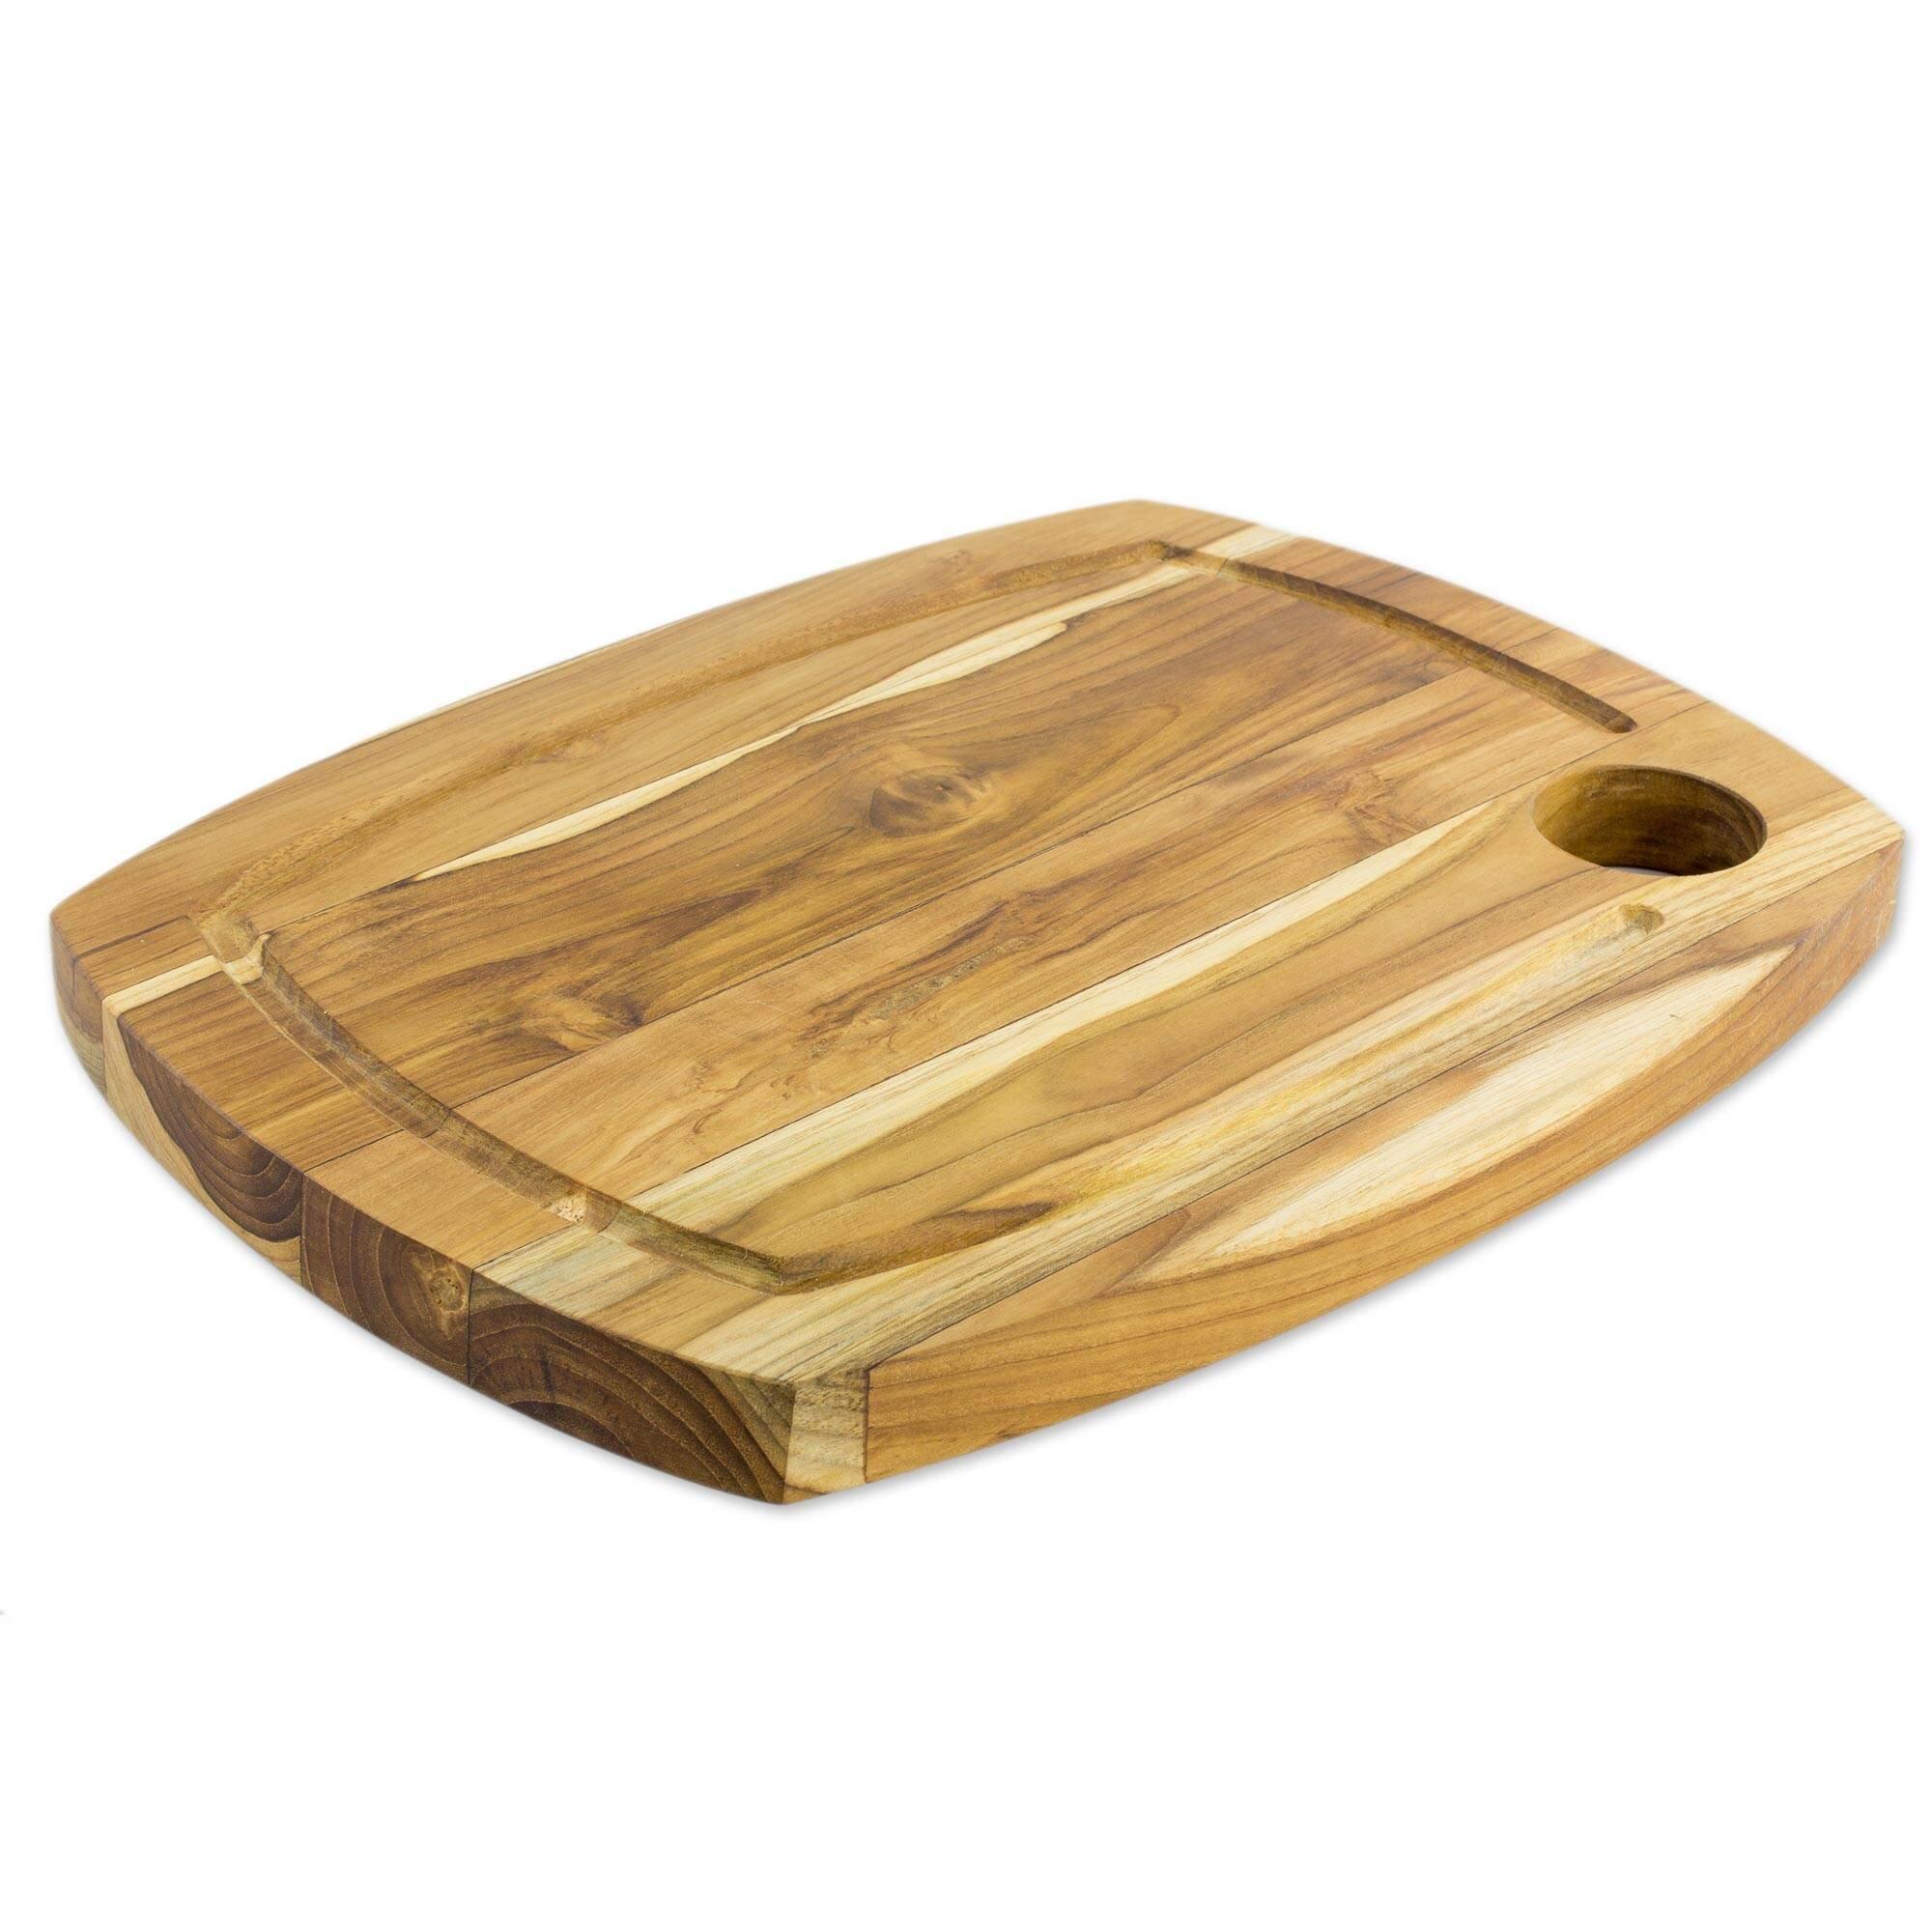 Dishwasher Safe Wood Cutting Boards You Ll Love In 2021 Wayfair